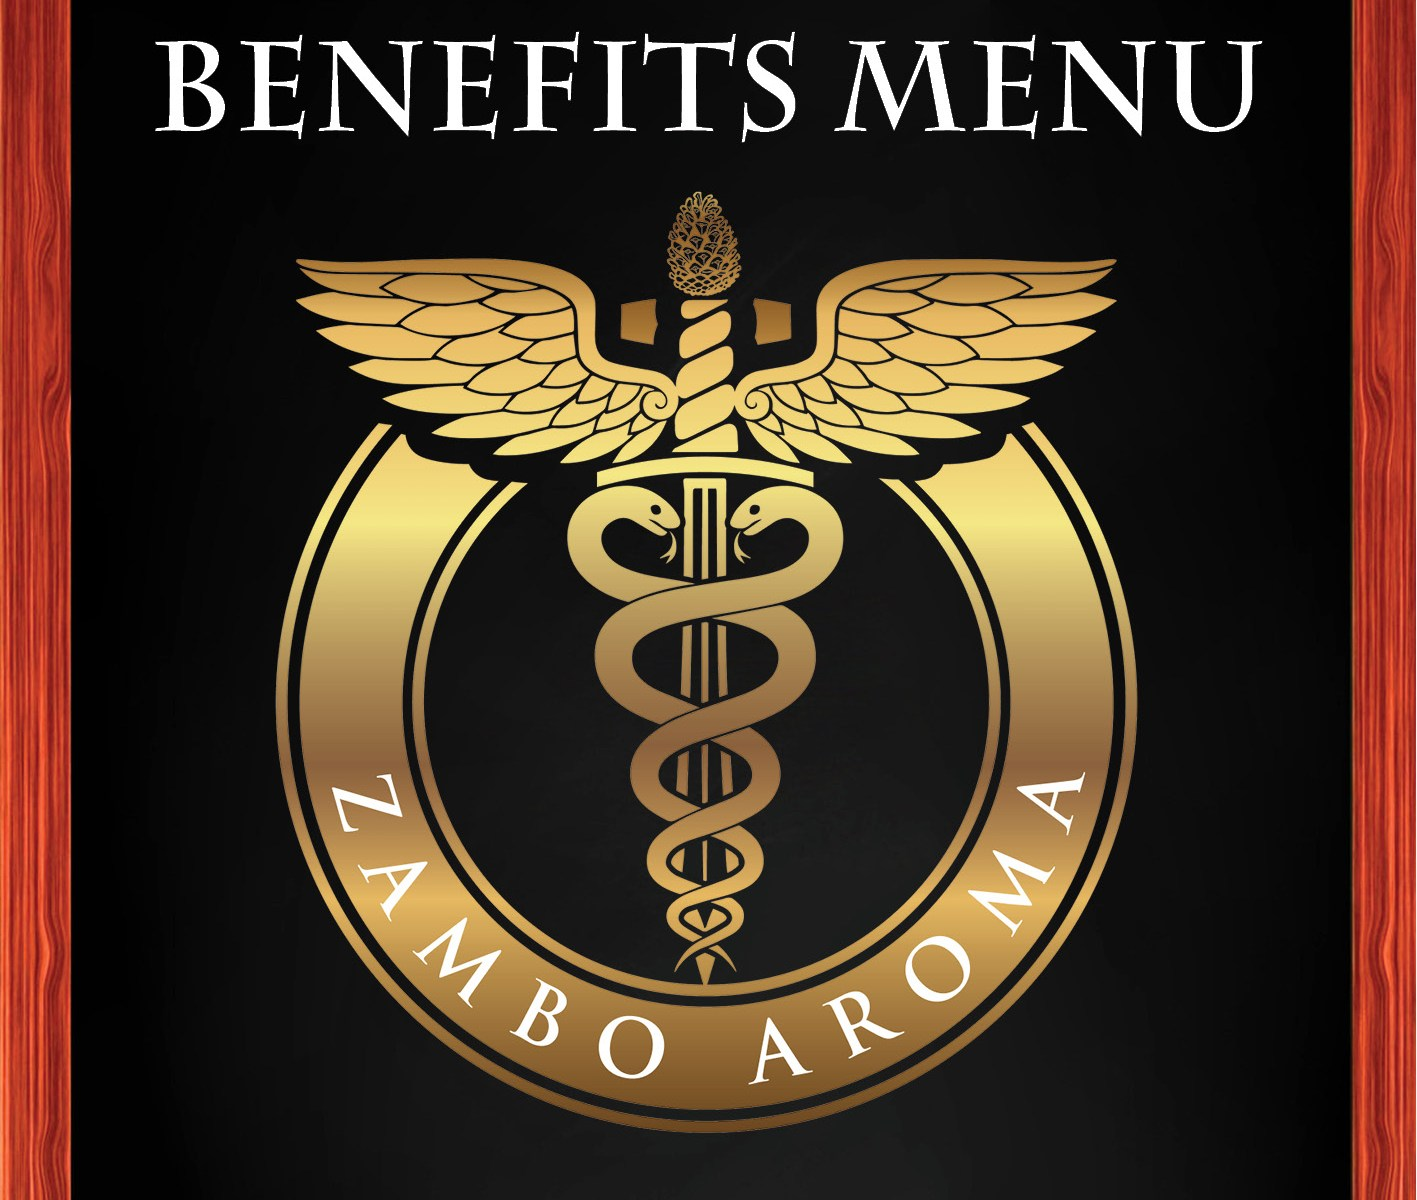 beneffits menu